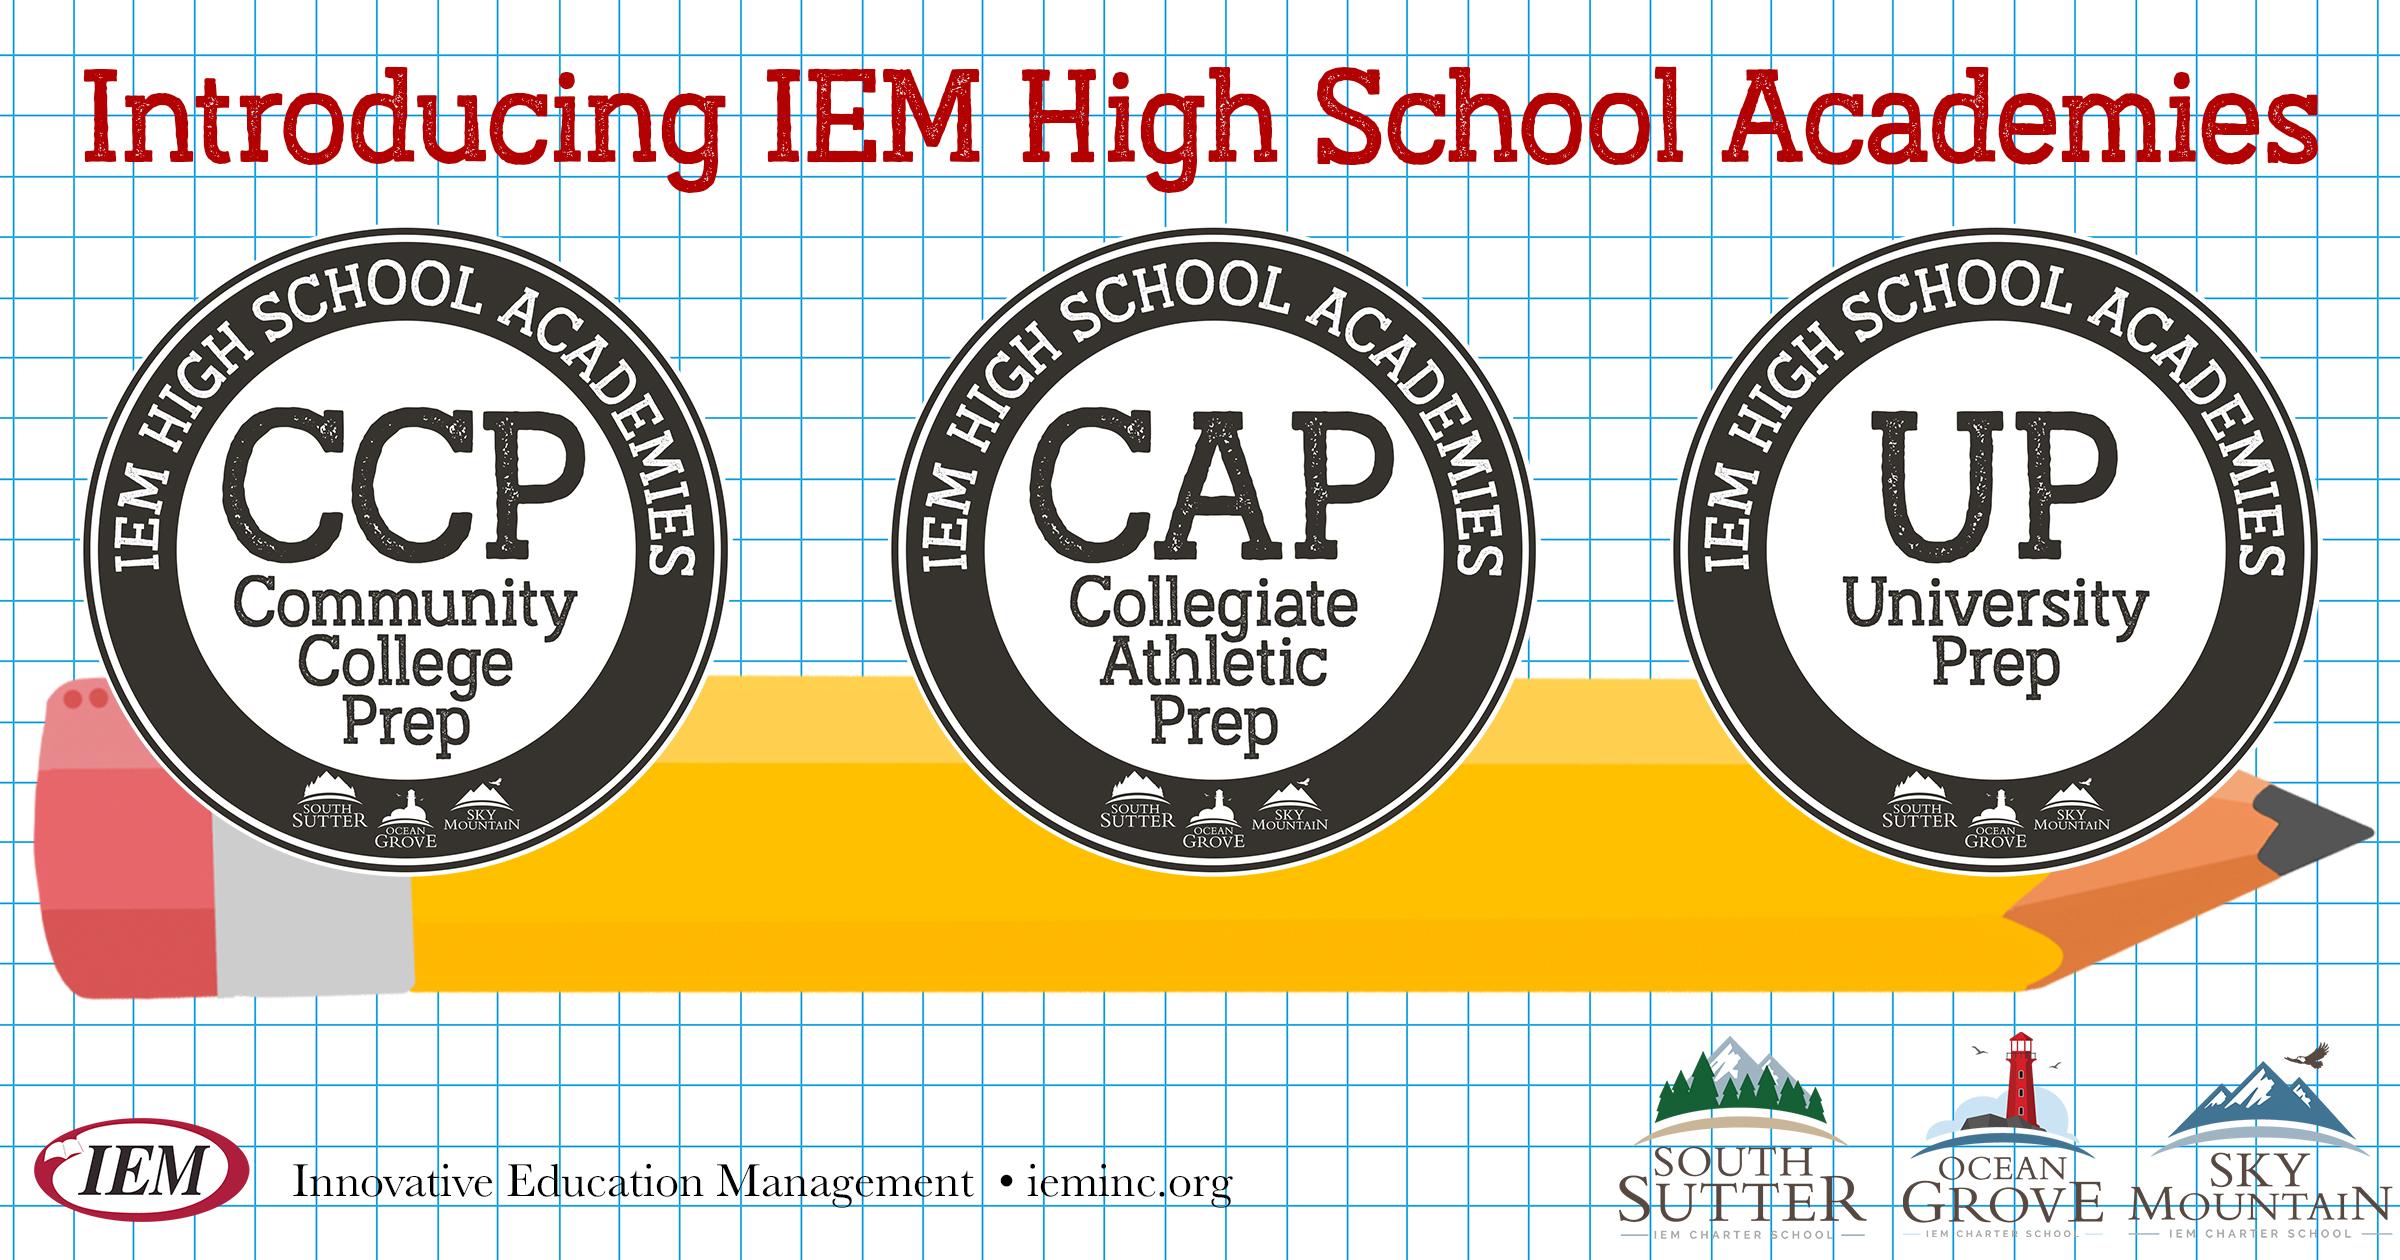 High School Academies